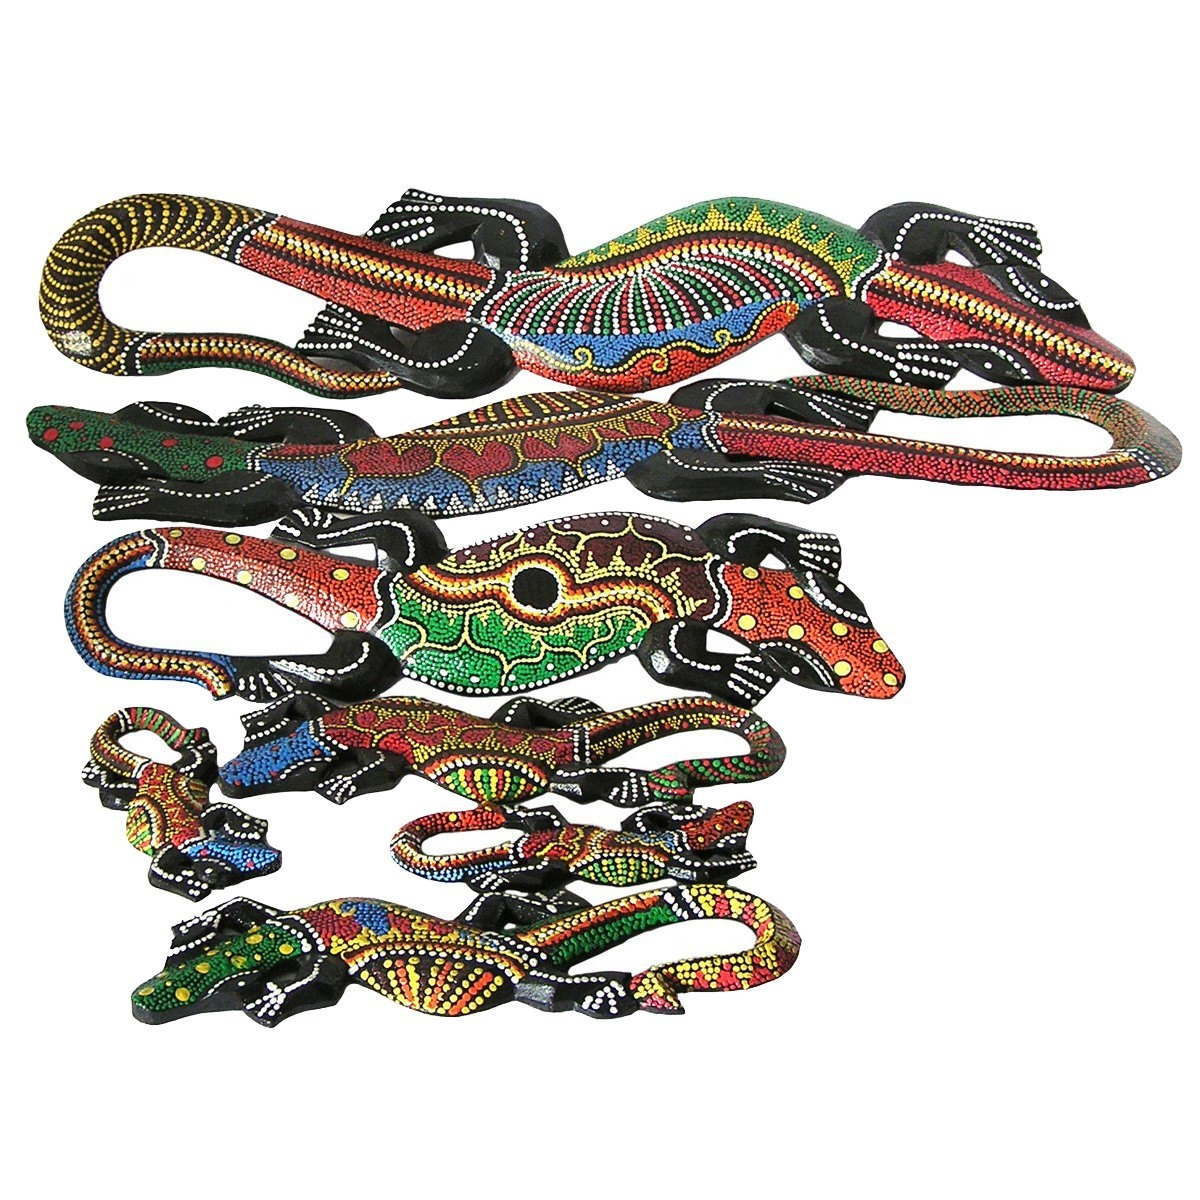 gecko echse deko figur wanddeko holzfigur wandfigur afrika asia salamander ebay. Black Bedroom Furniture Sets. Home Design Ideas